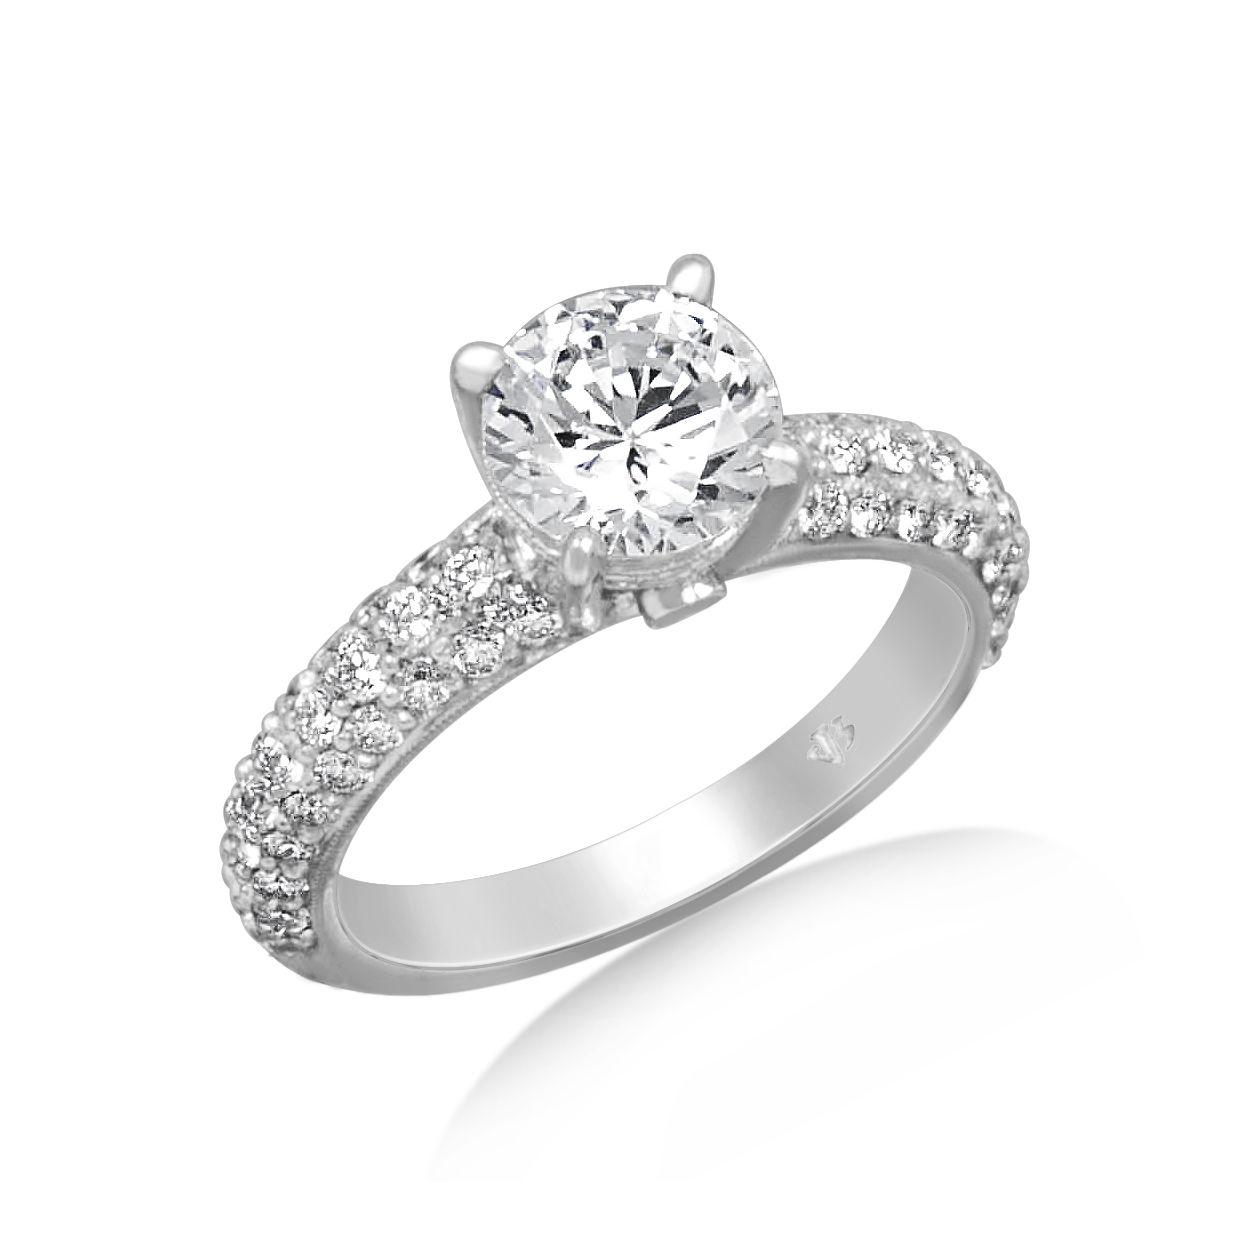 Chicago Bridal Marshall Pierce Company Jack Kelege Tapered